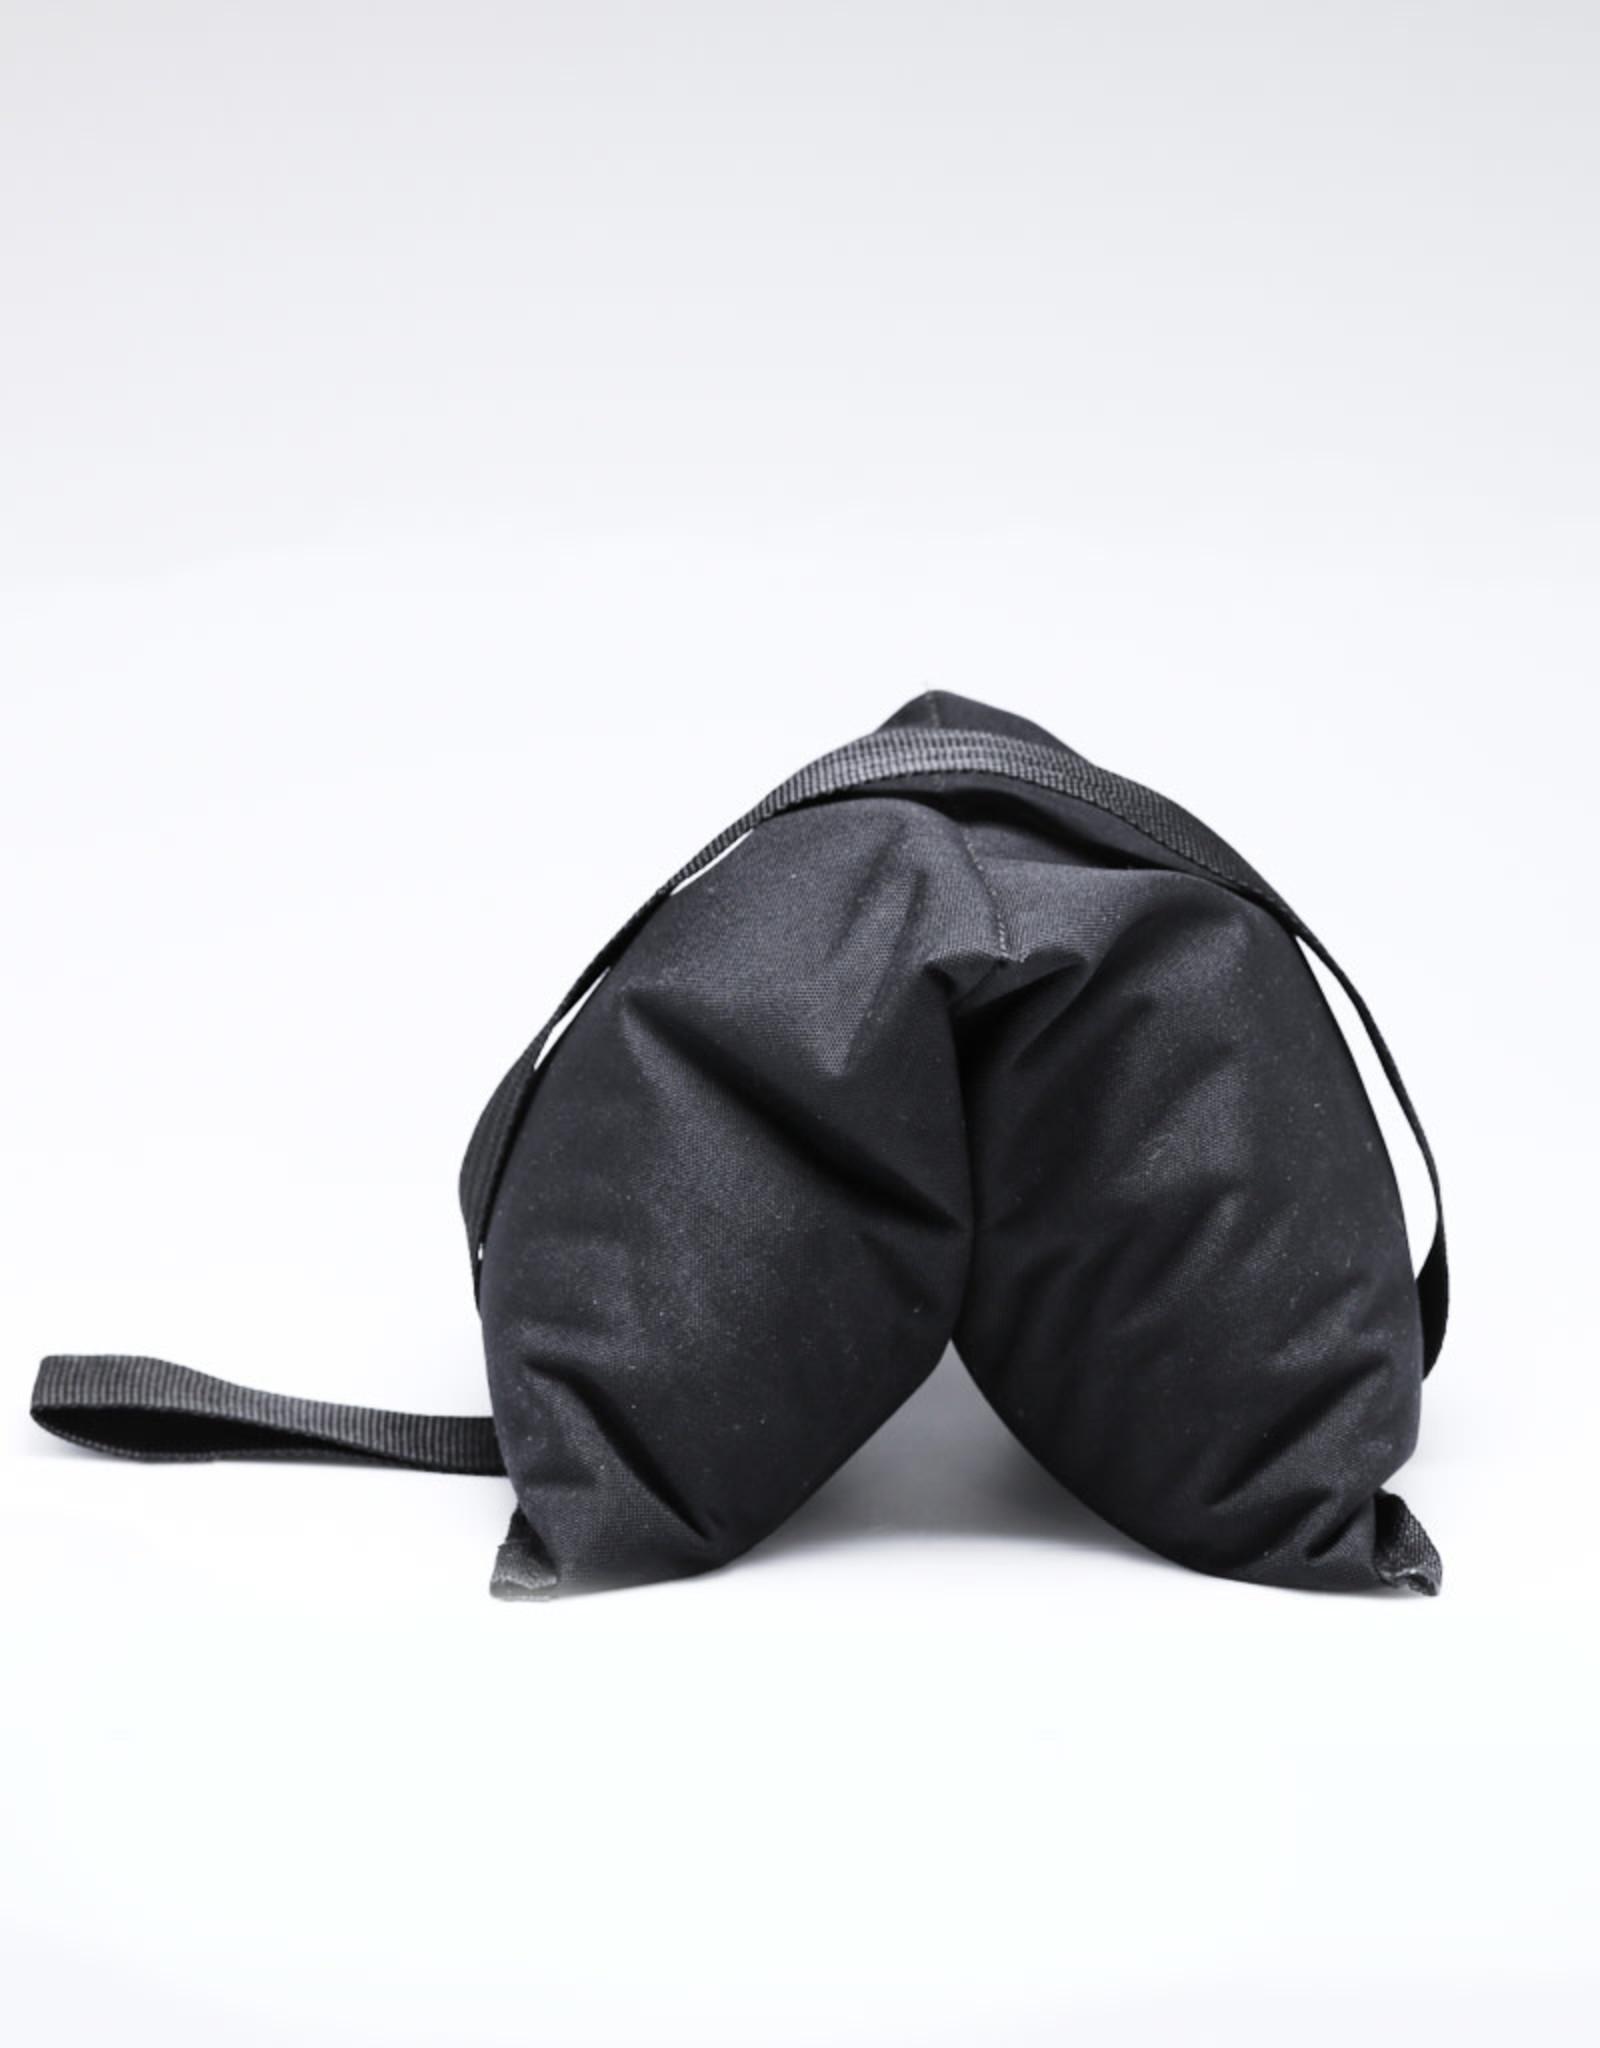 25lb Black Saddlebag Sandbag - Cordura